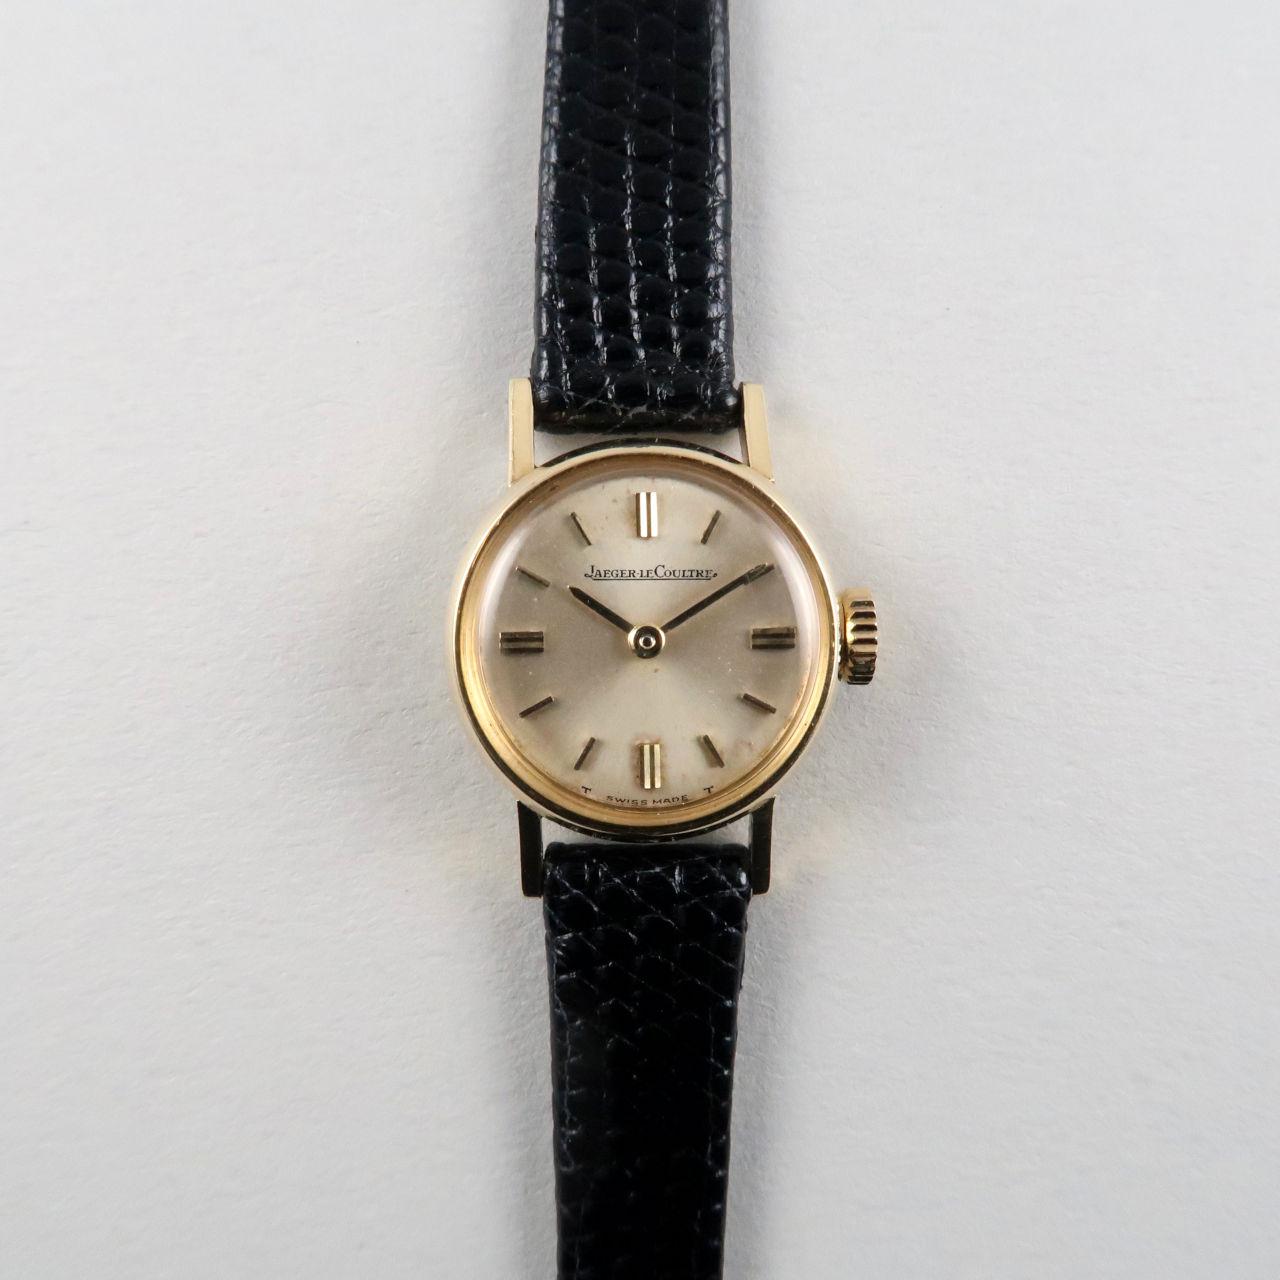 Jaeger-LeCoultre Ref.1655 18ct gold wristwatch